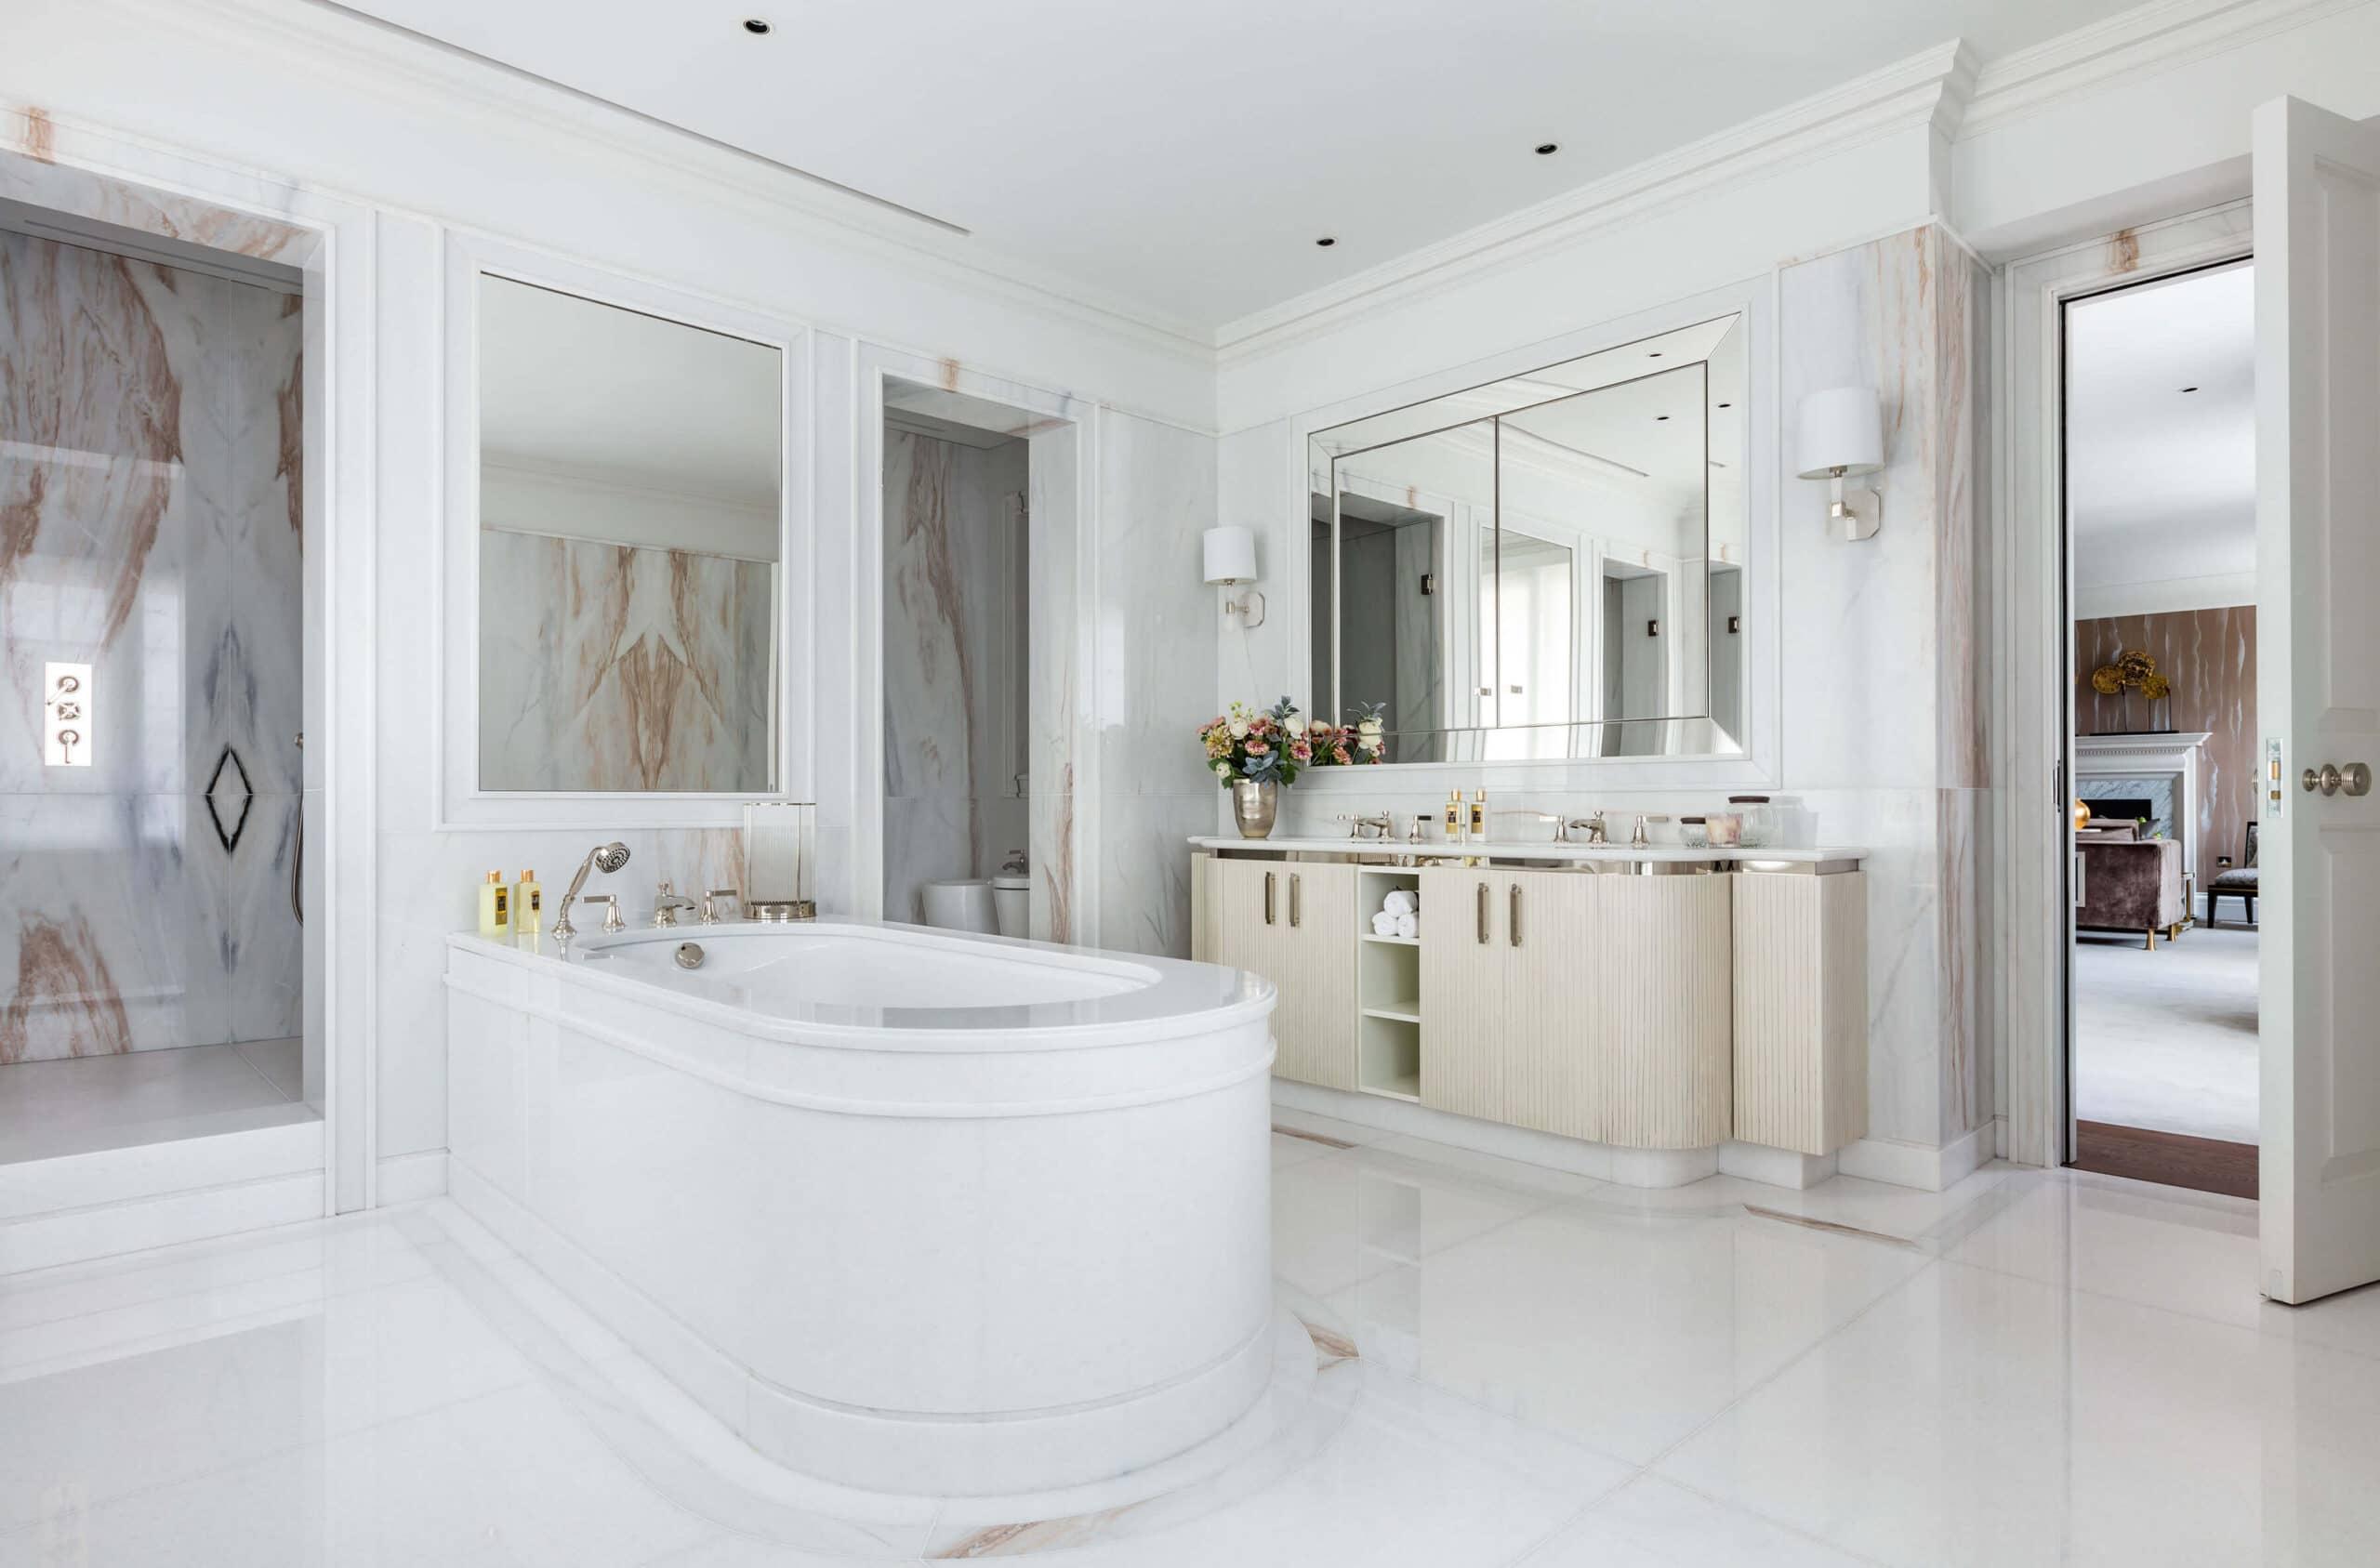 bathroom in luxury interior design project in Westminster